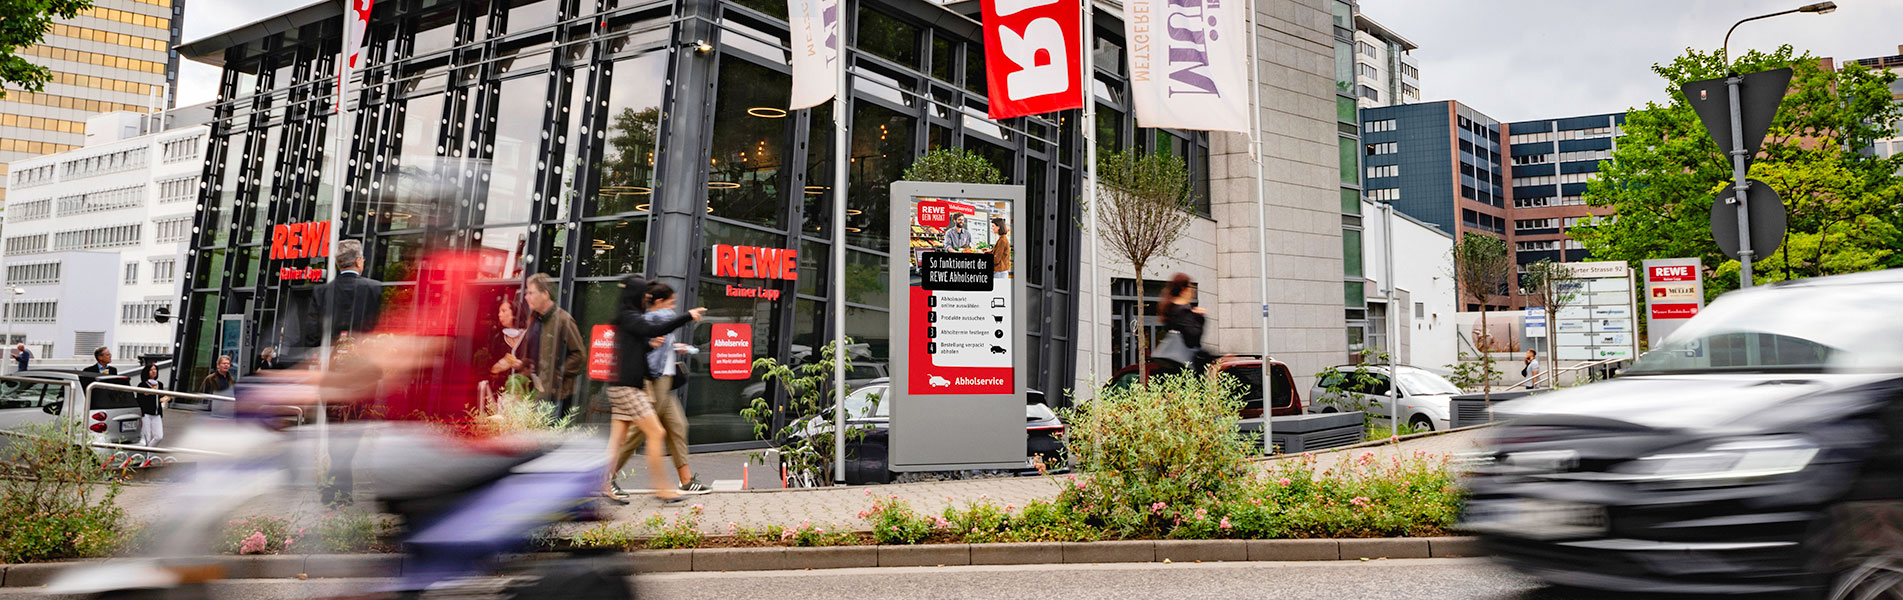 Digitales City Light Poster vor einem lokalen Rewe